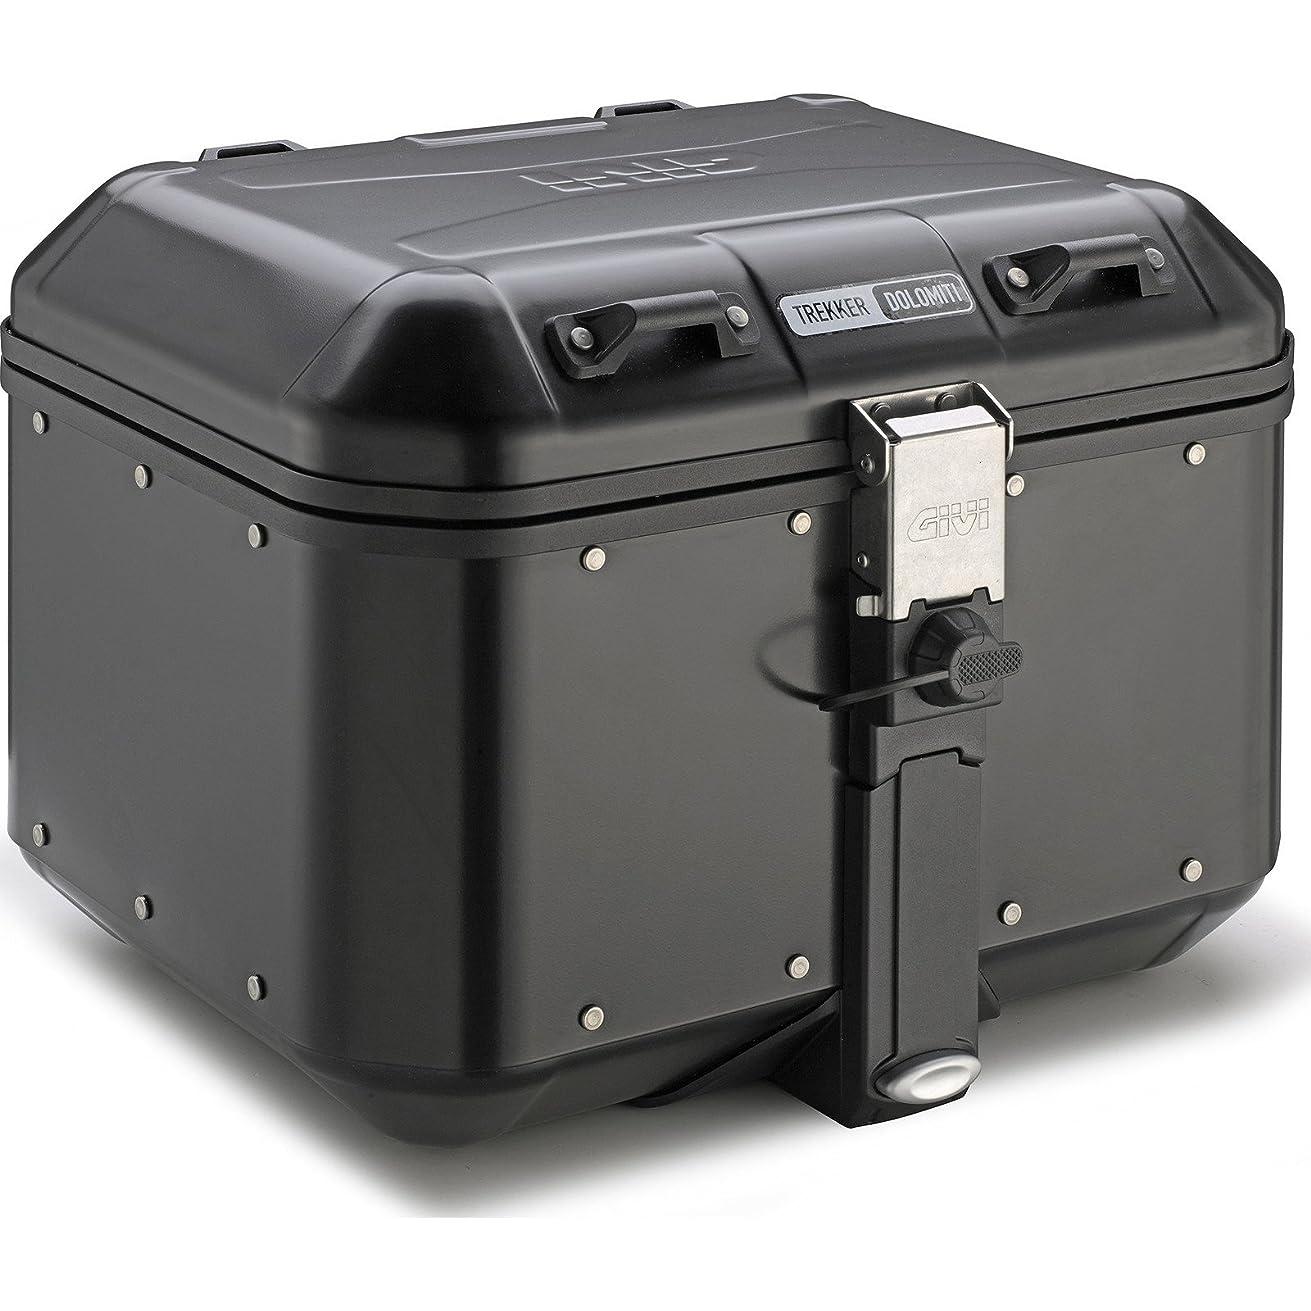 GIVI DLM46B 46 Liter Dolomiti Monokey Aluminum Top Case - Black